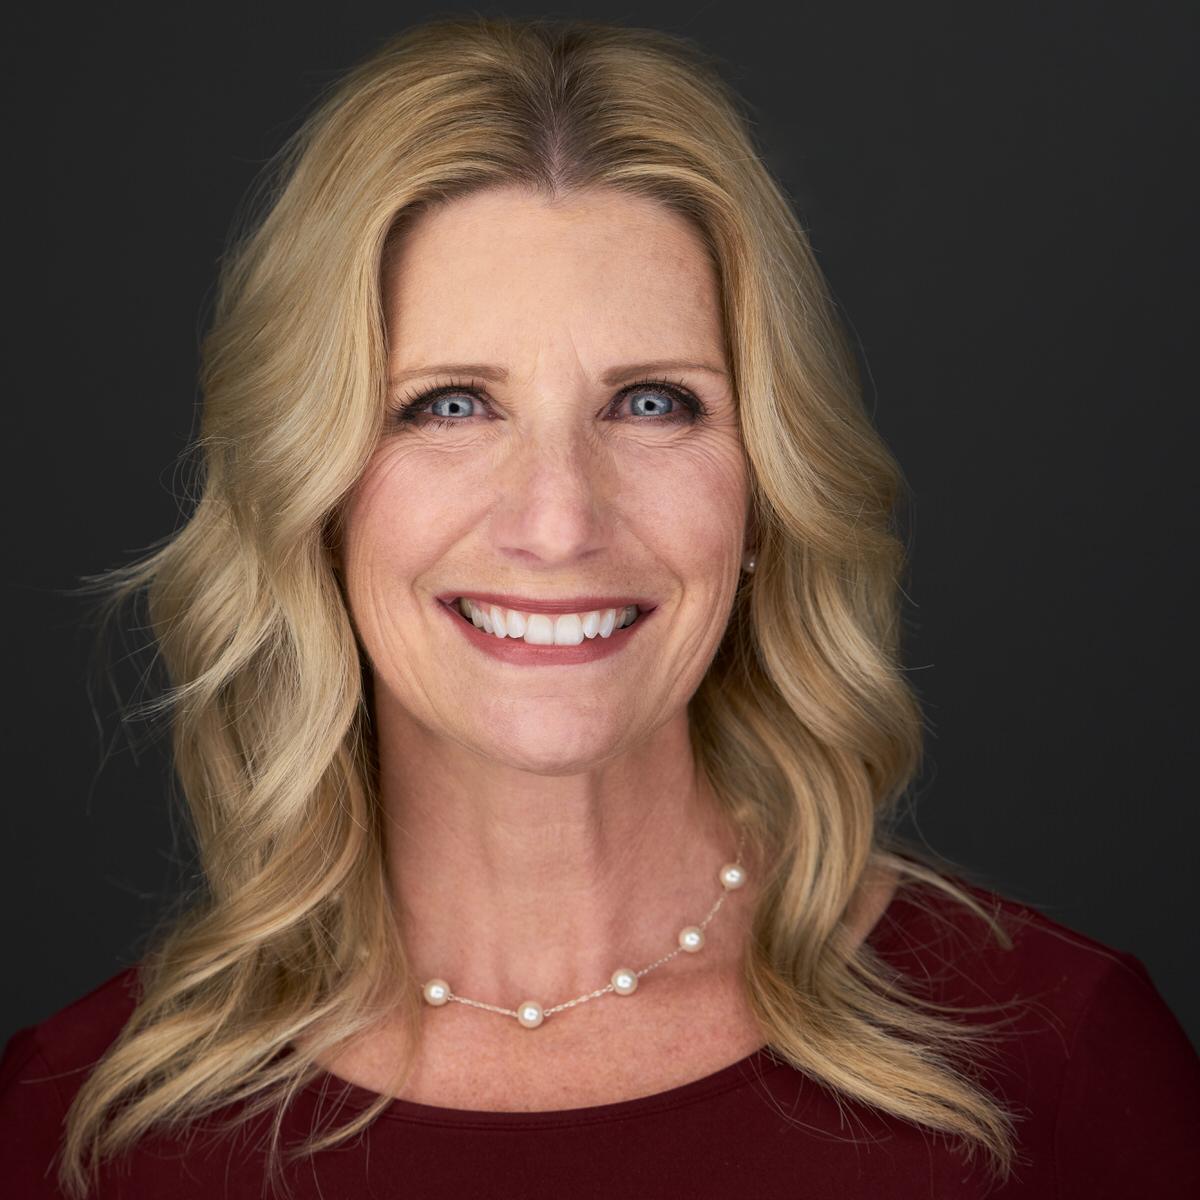 Author Belinda Goodrich